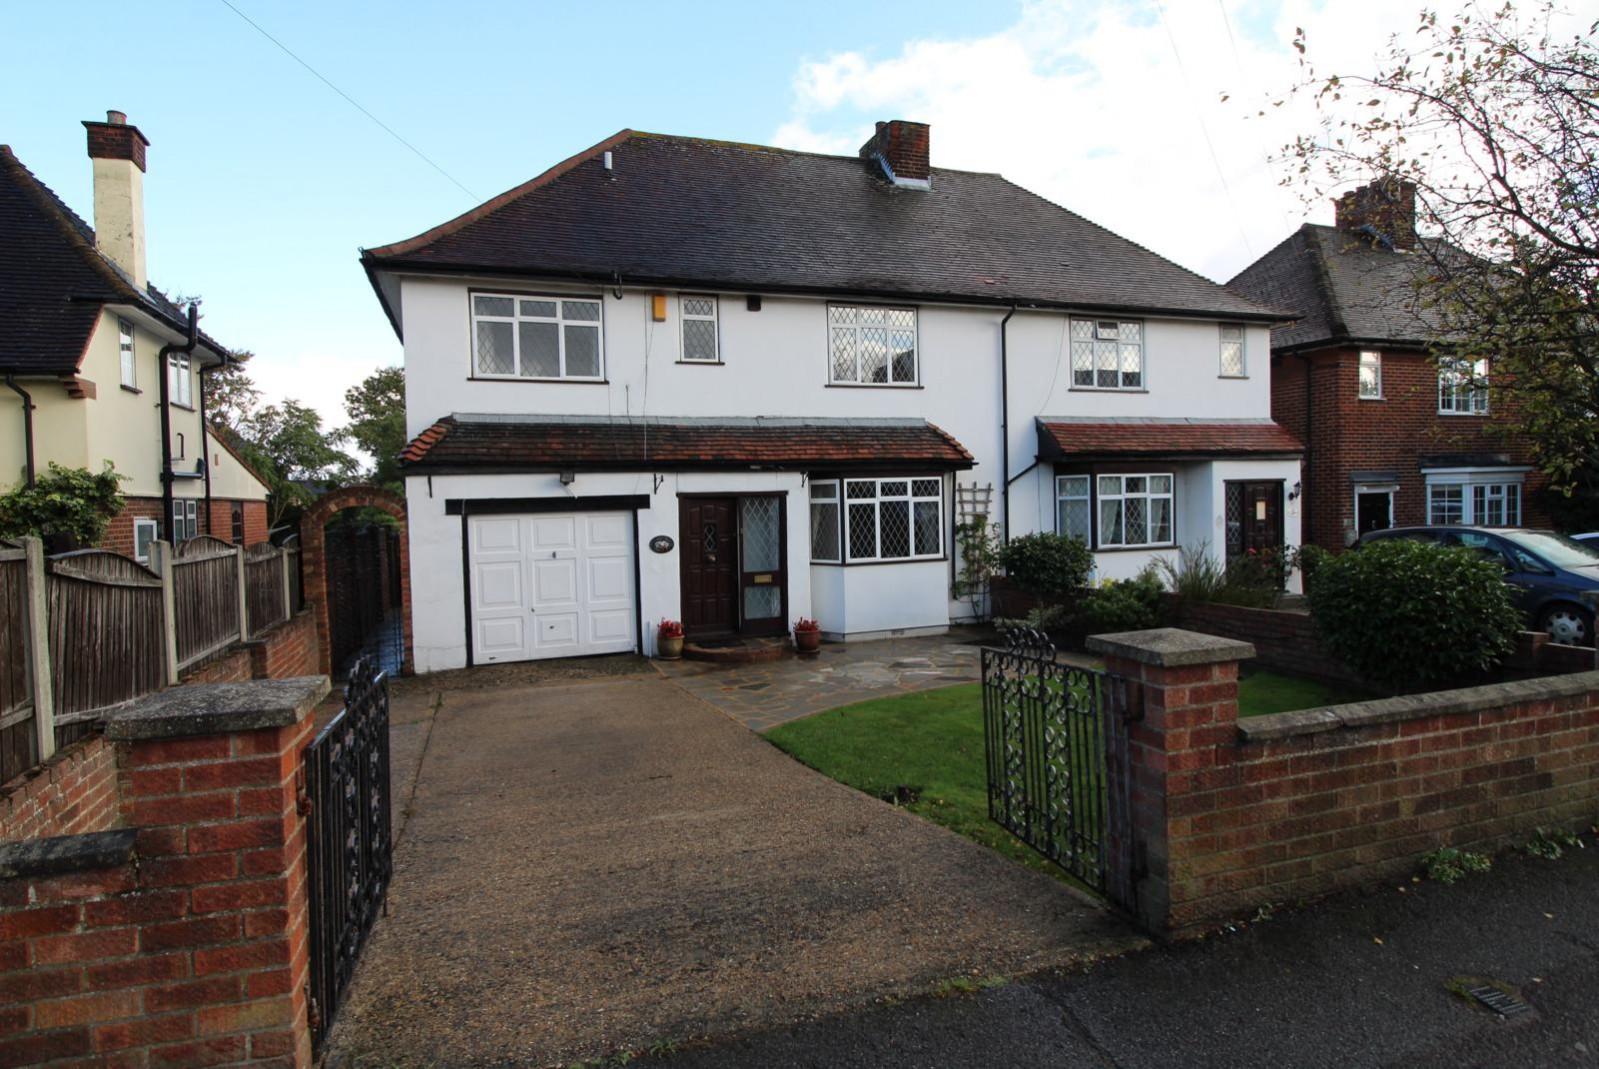 Park Lane, Aveley, South Ockendon, Essex, RM15